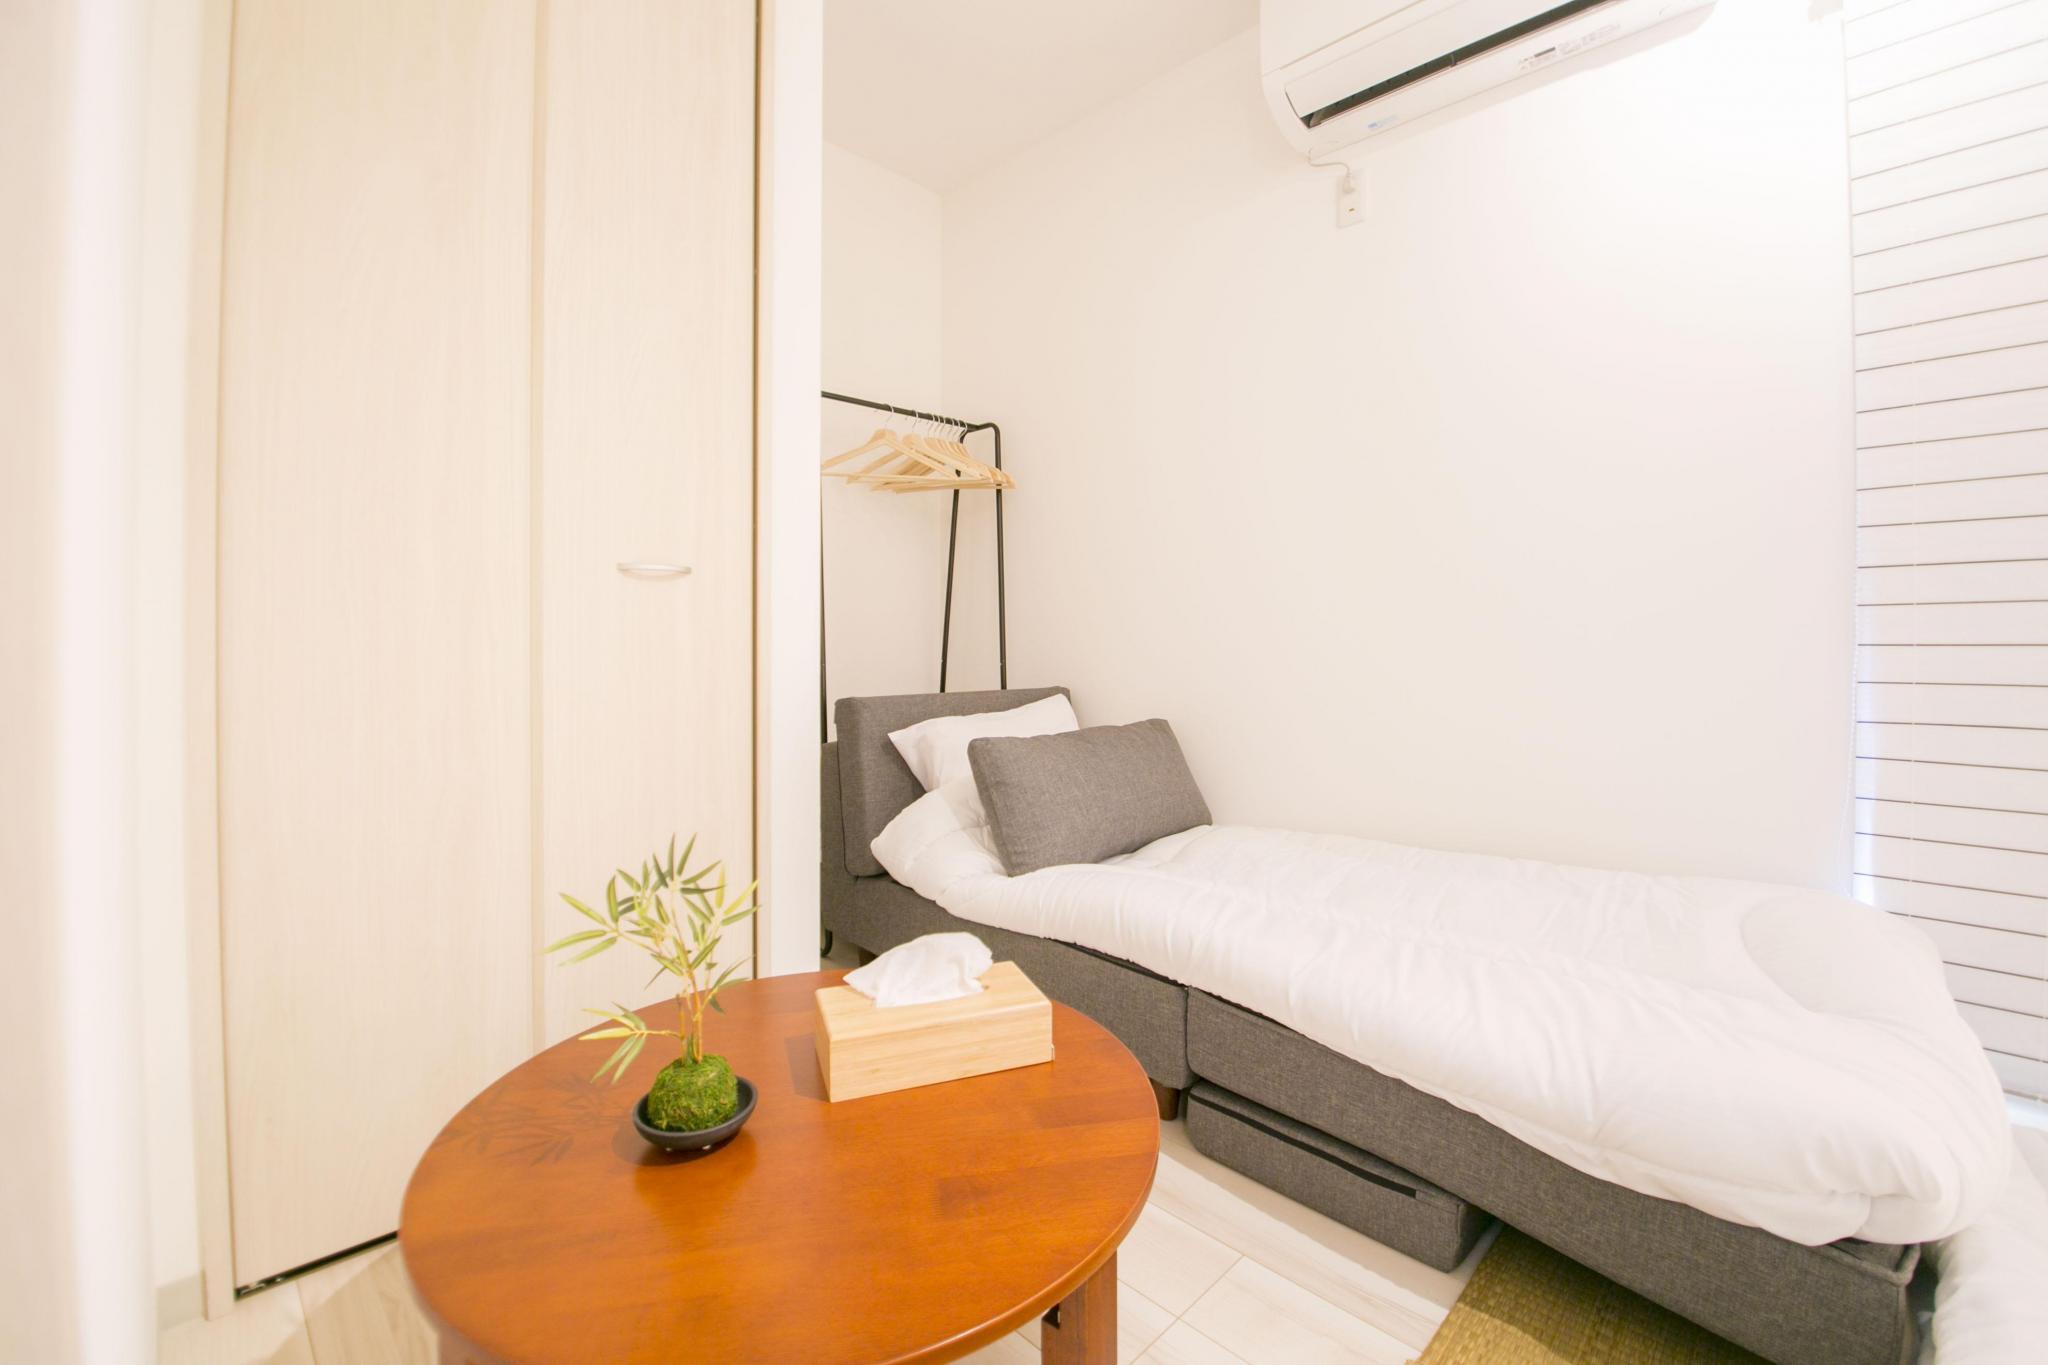 1K Apartment - Akasaka - Minato-ku - Tokyo - Japan - For Rent - Real ...